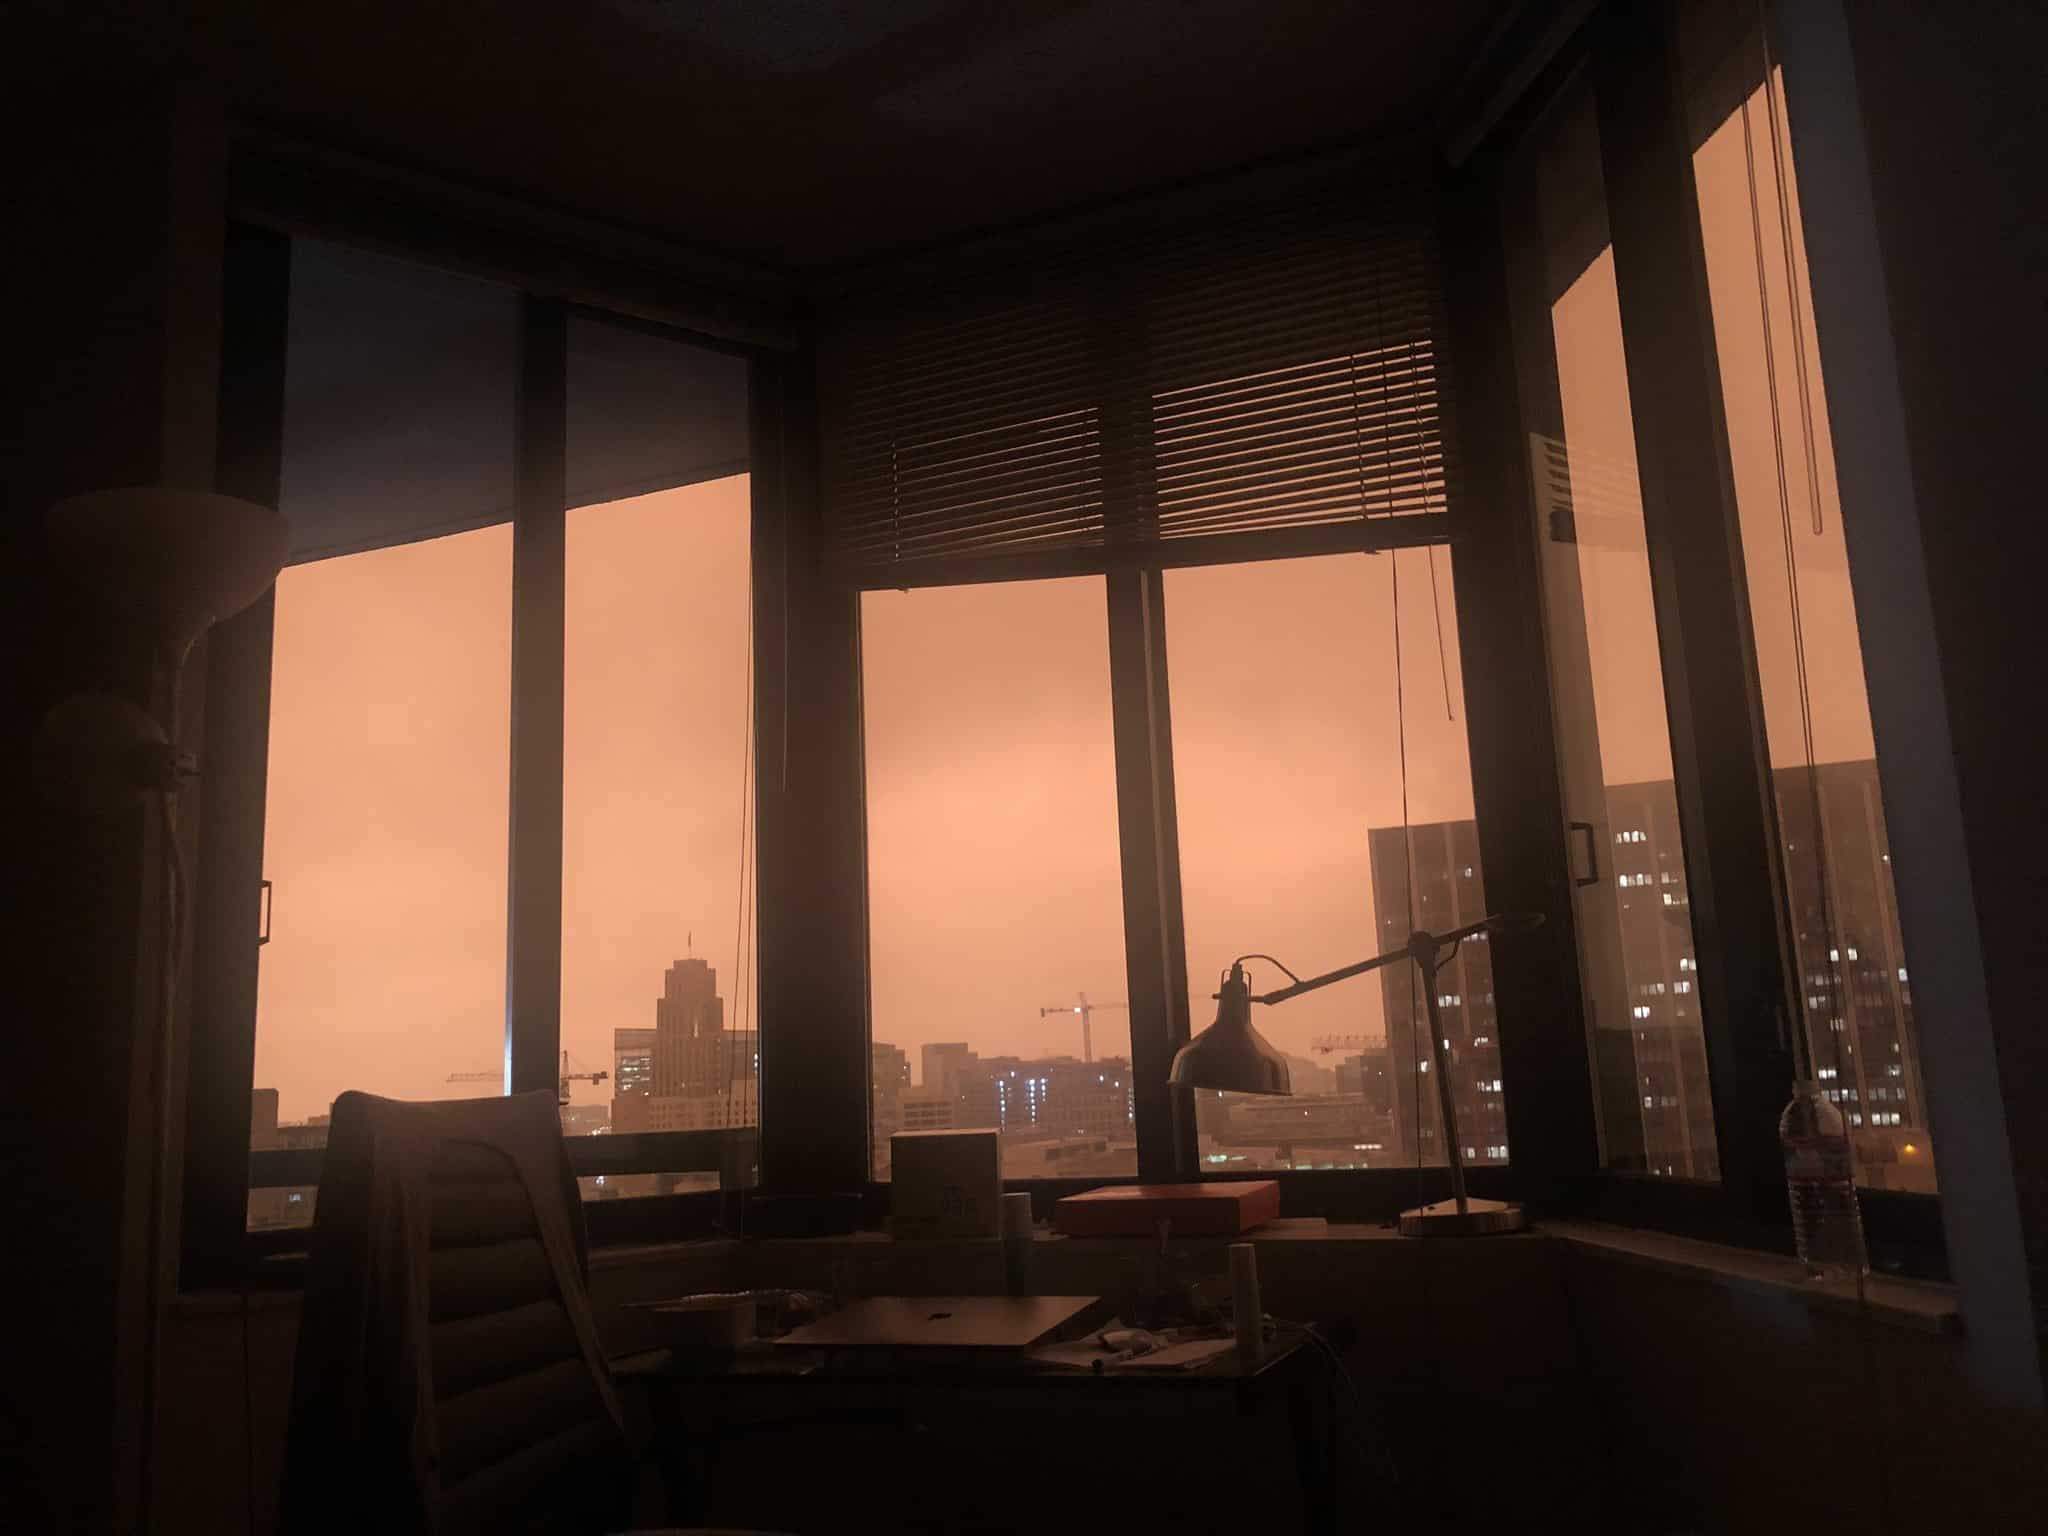 San Francisco bay area sky